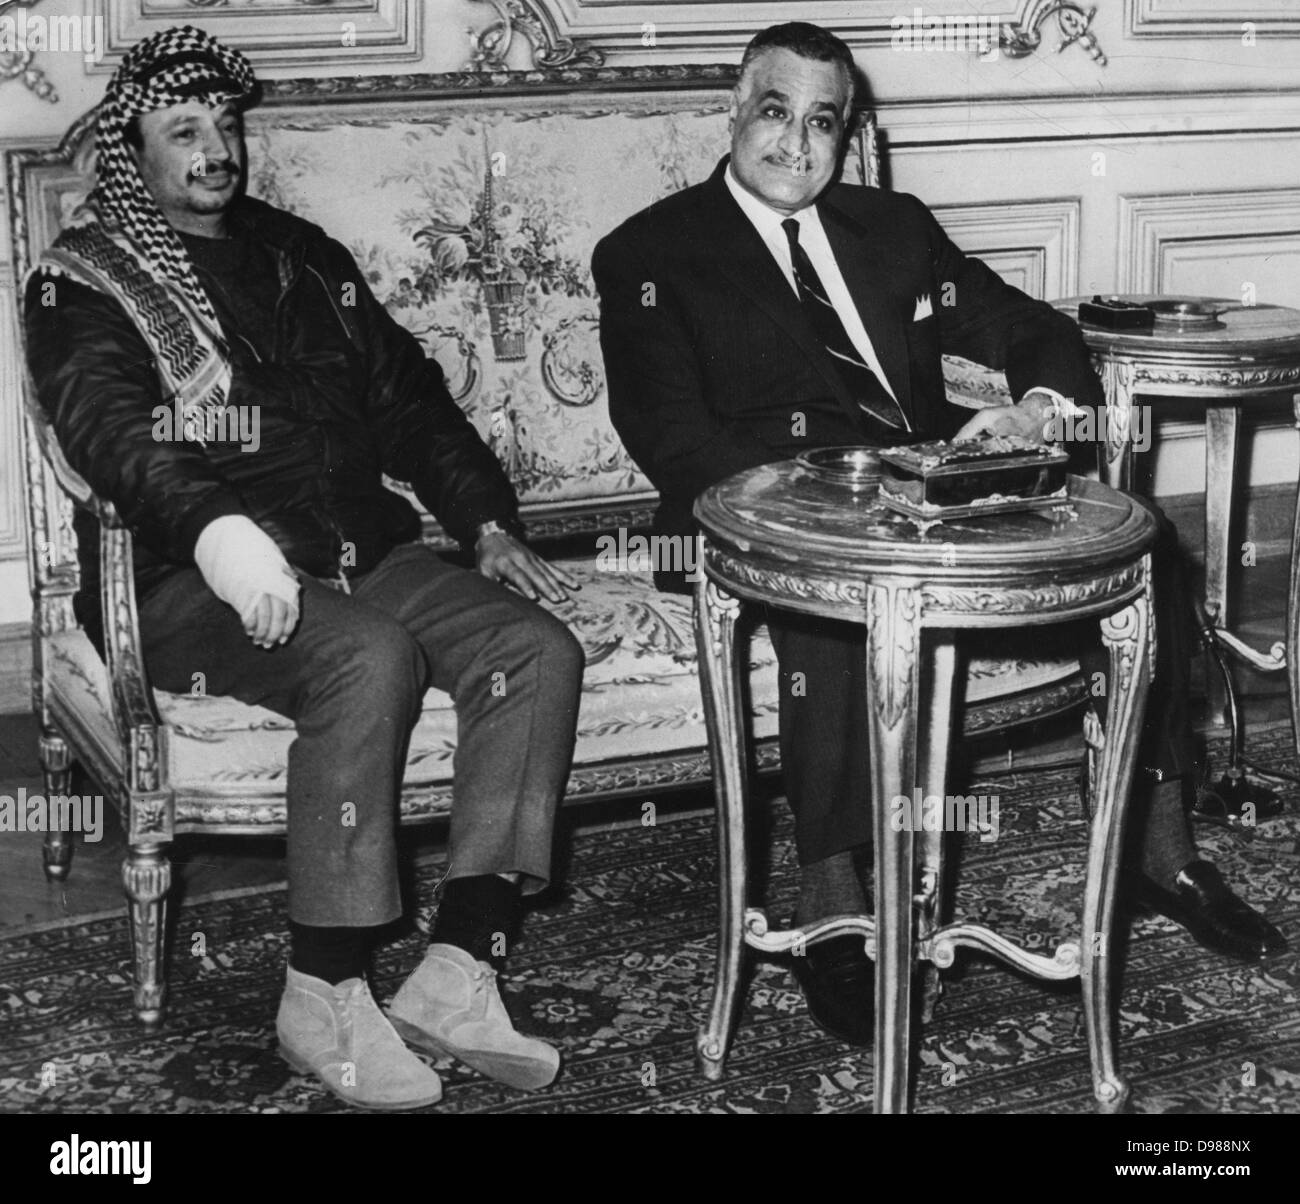 Gamal Abdul Nasser (1918-1970) President of Egypt, with Yasser Arafat (1929-2004) Chairman of the Palestine Liberation - Stock Image